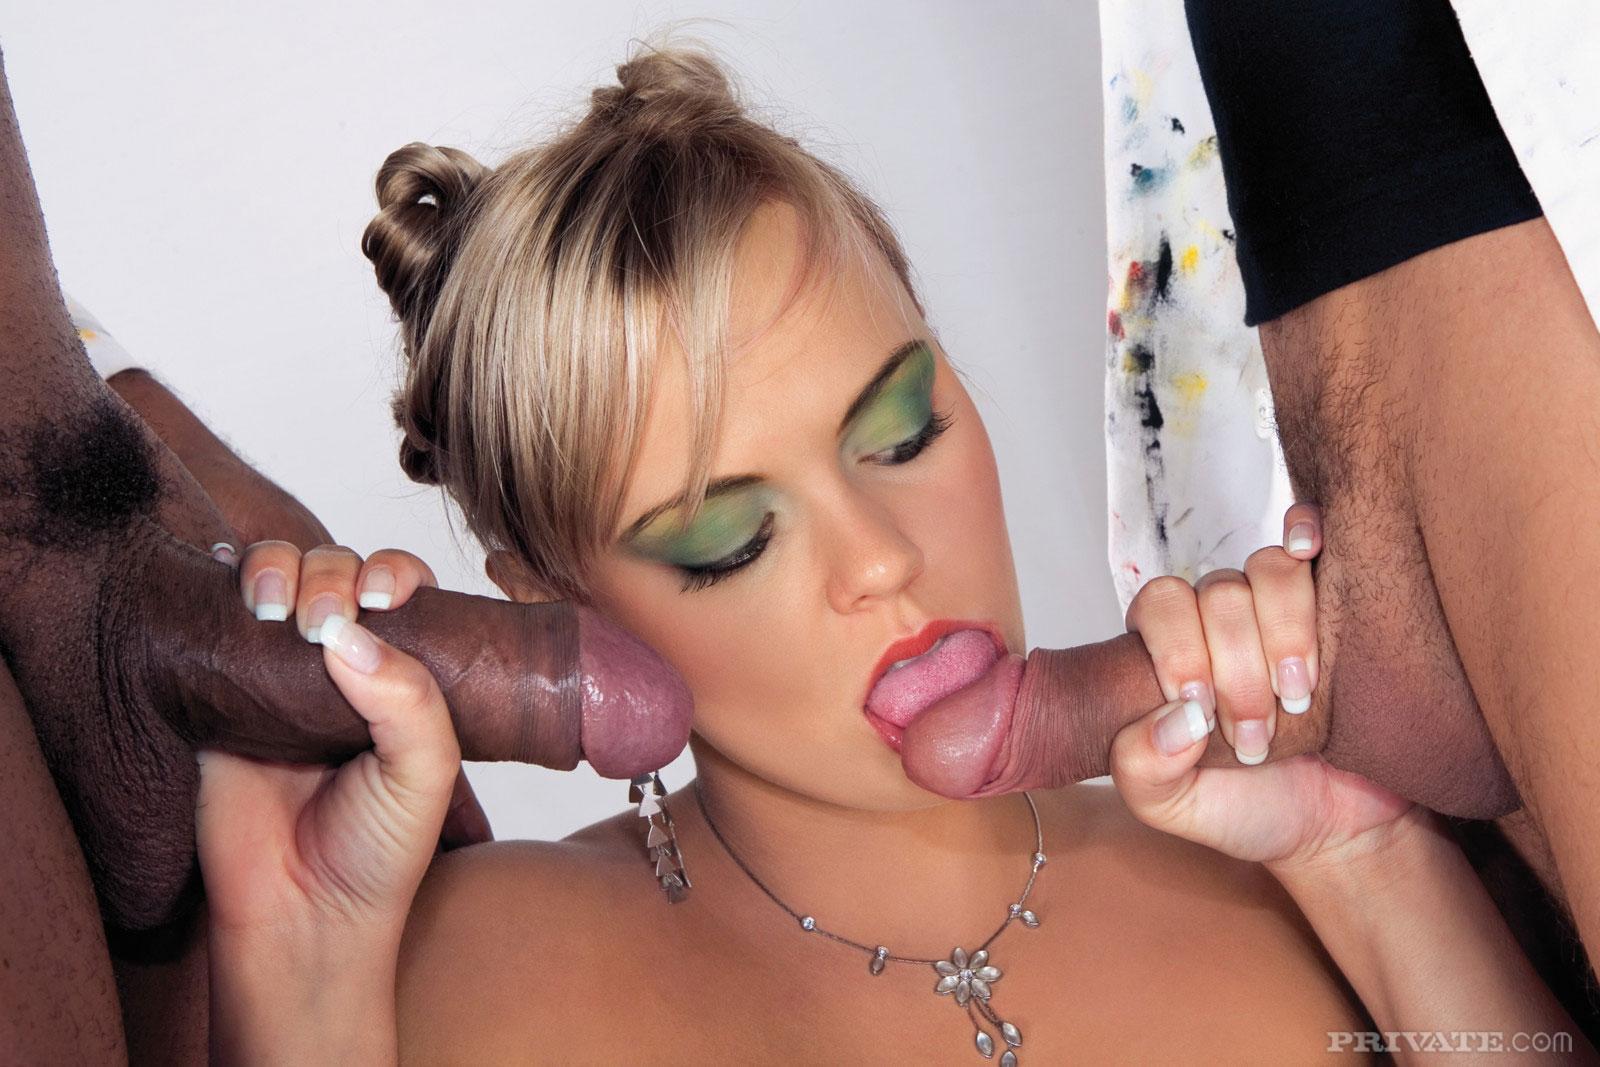 Порно нектар актрисы студии